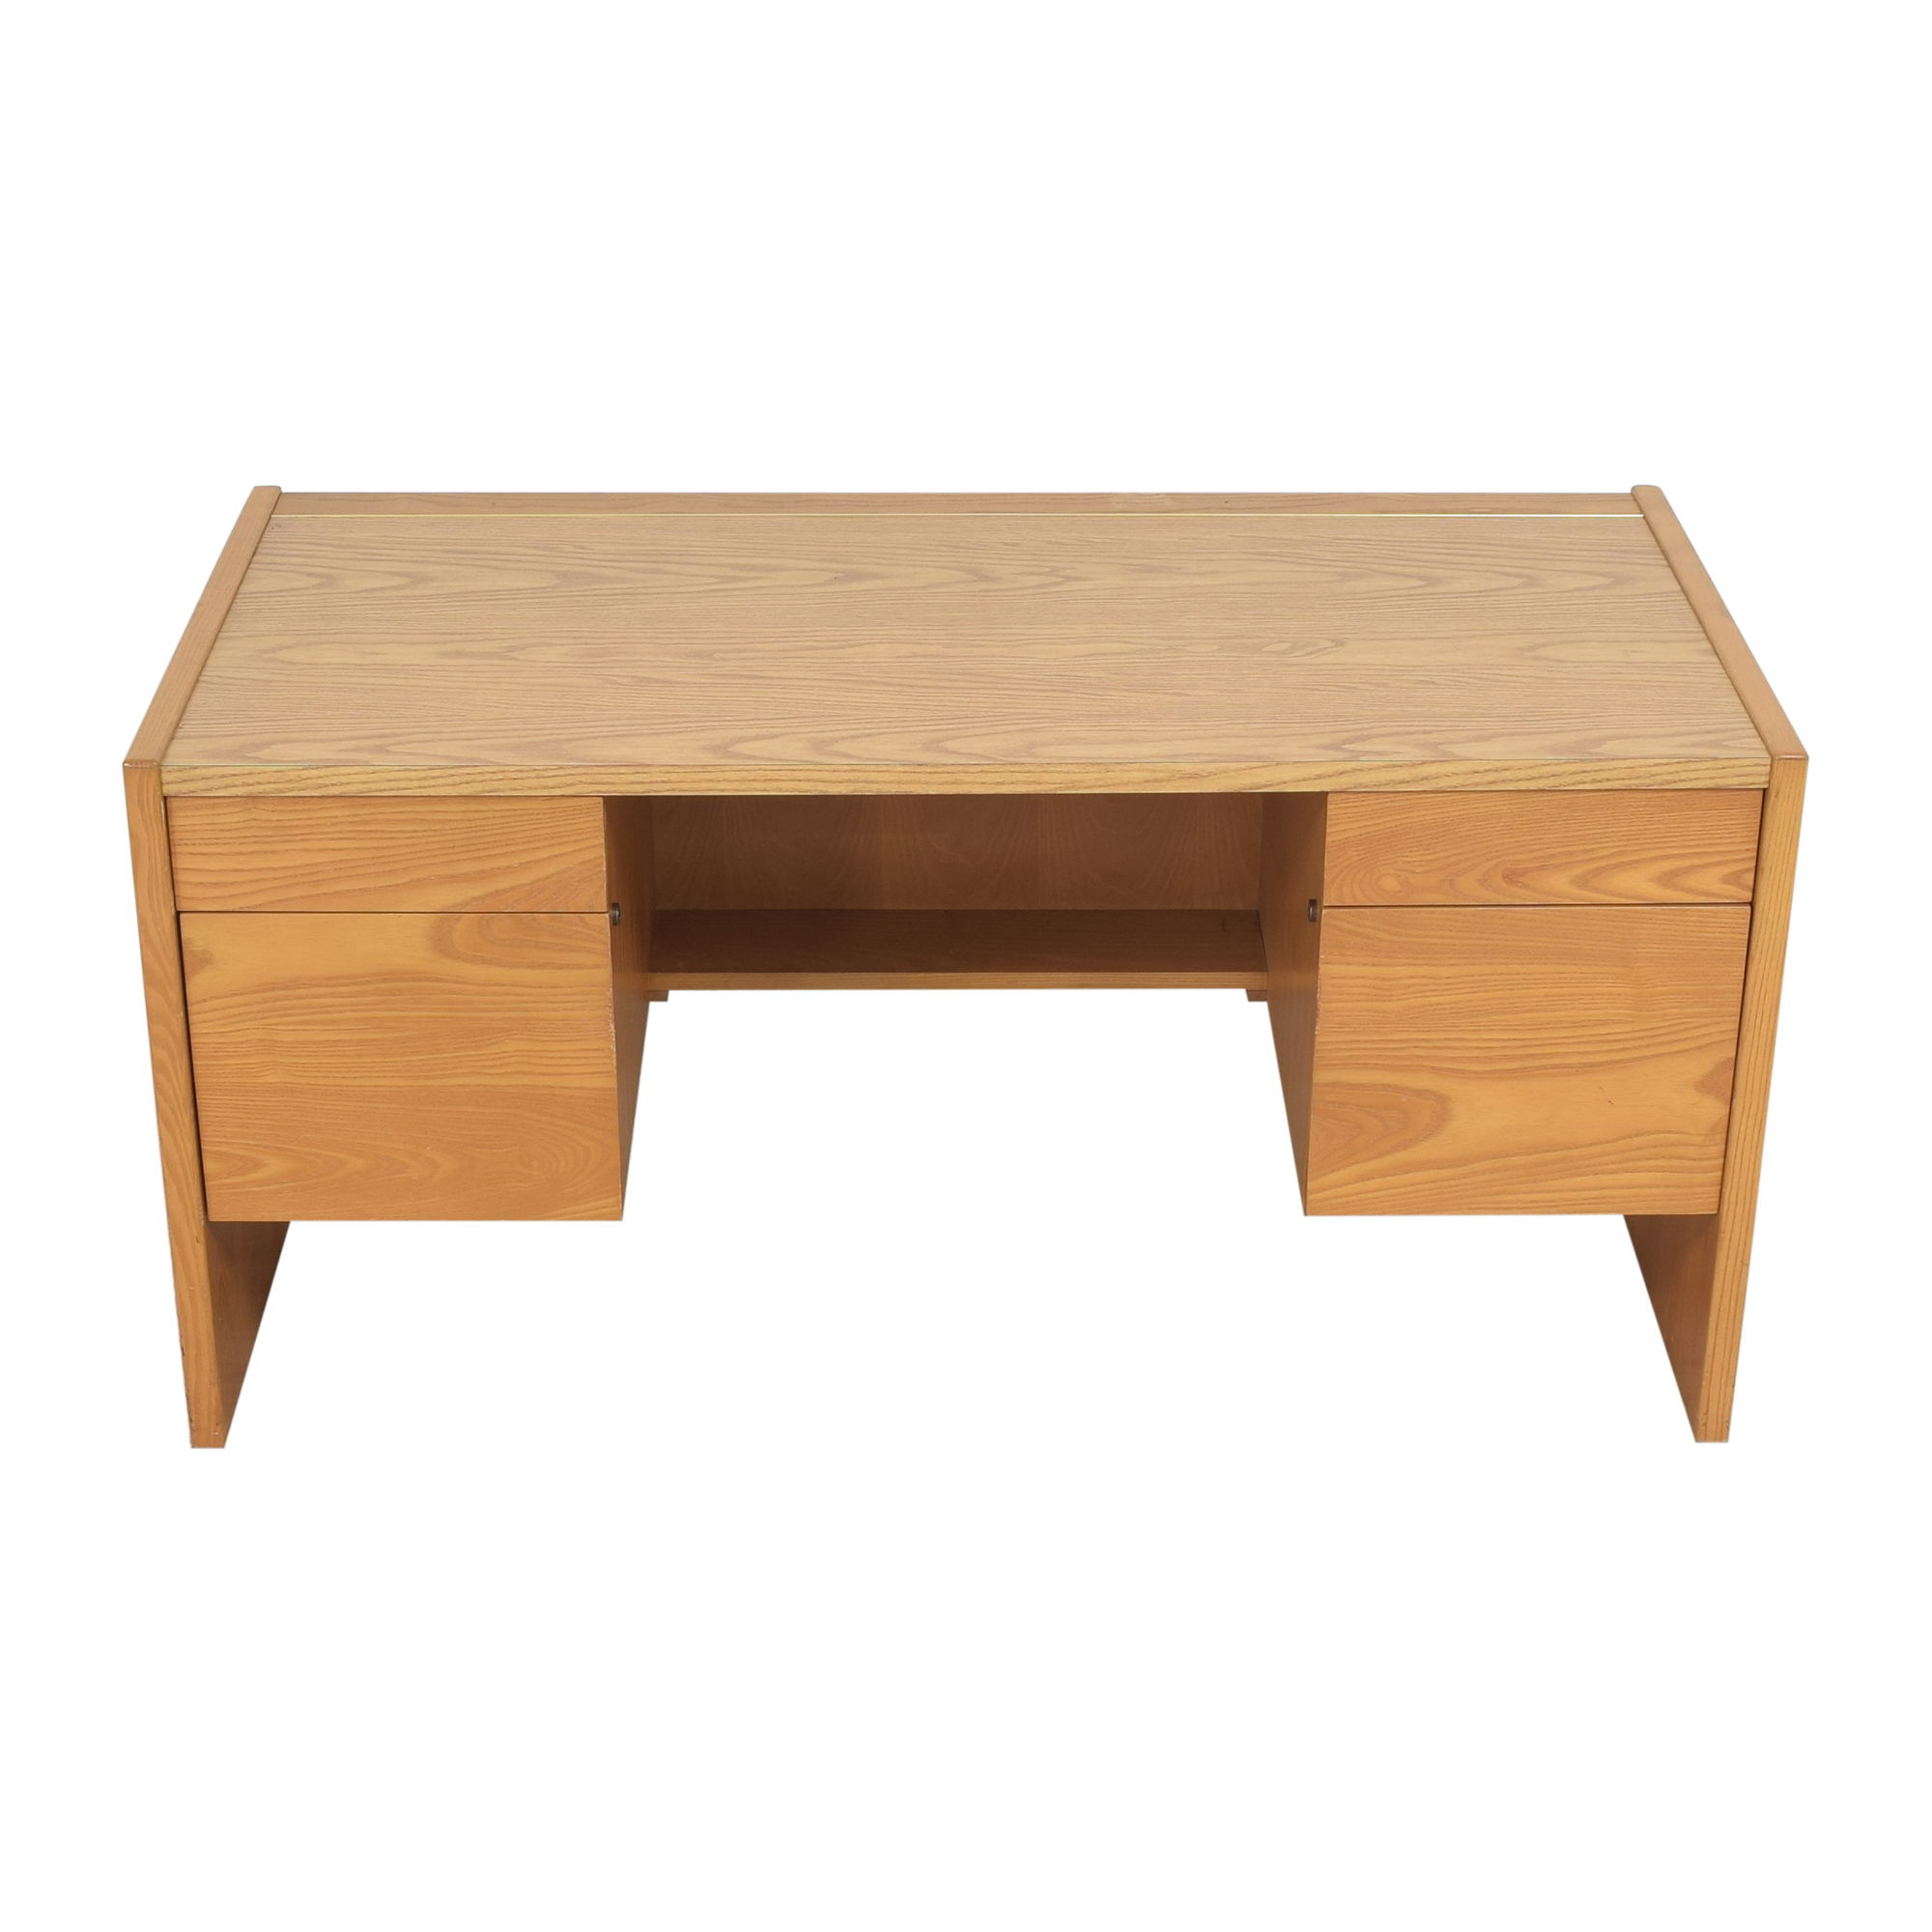 Boling Furniture Boling Executive Desk light brown